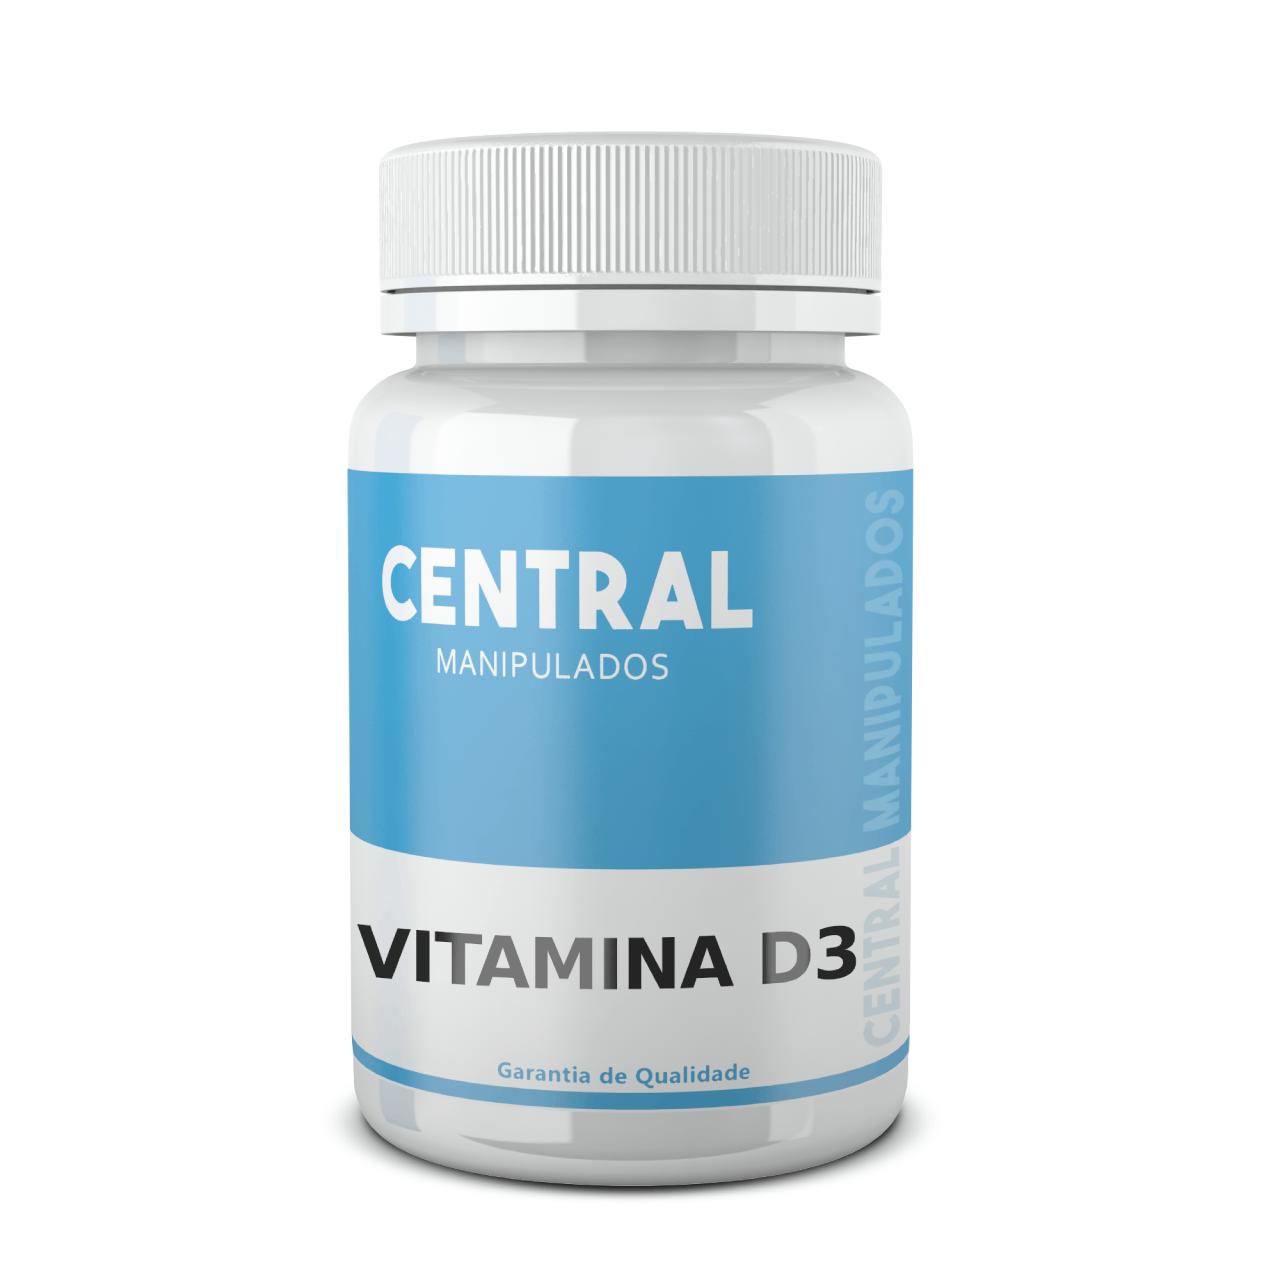 Vitamina D3 50.000 UI - 120 cápsulas - Saúde Óssea e Muscular